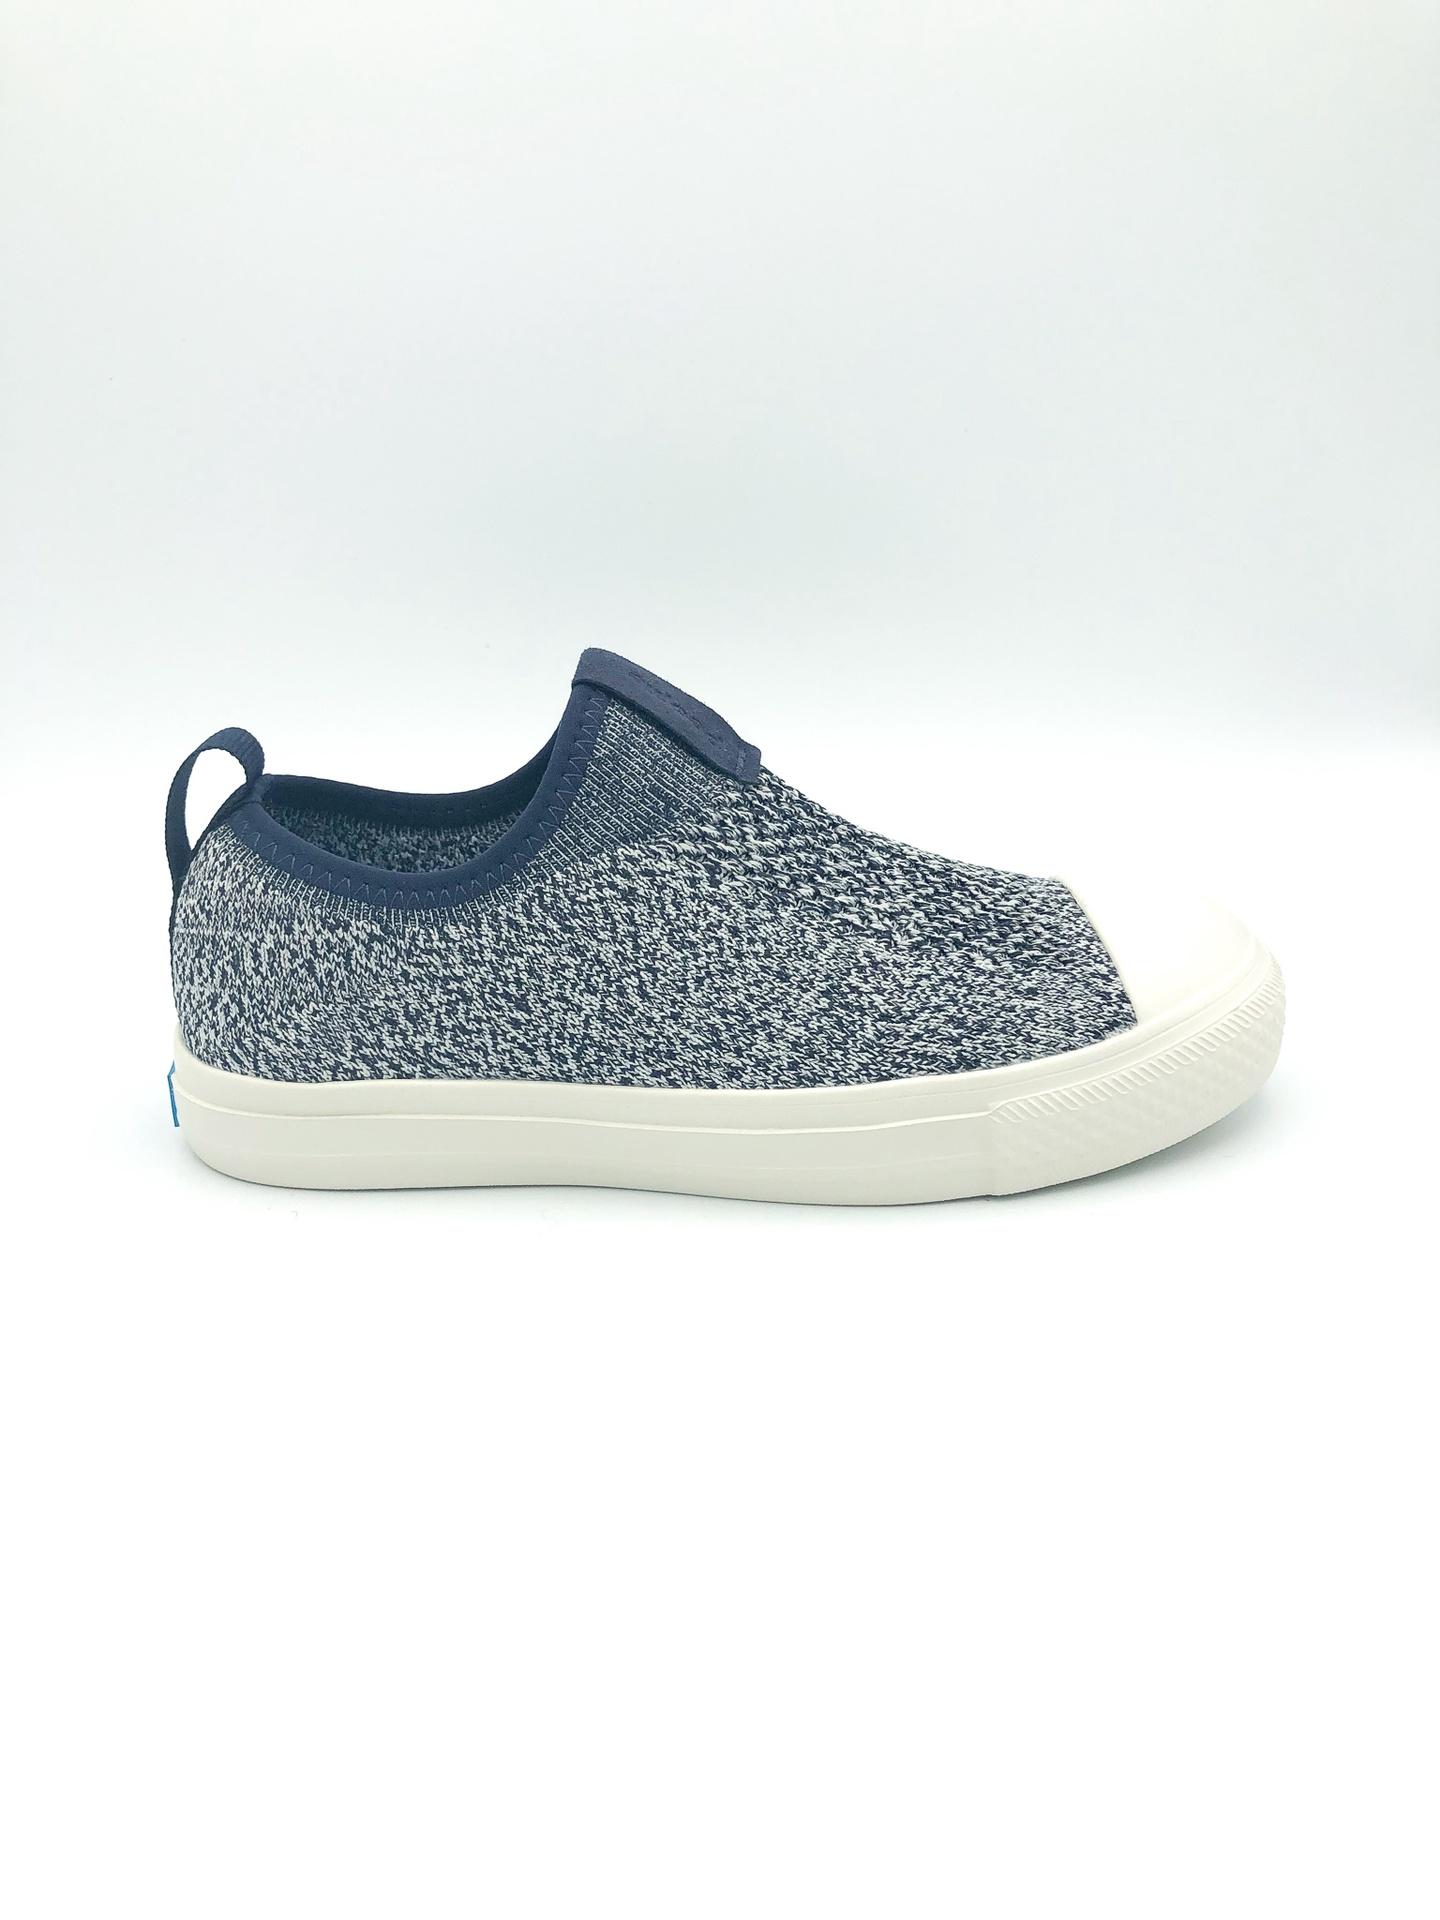 PEOPLE FOOTWEAR - THE PHILLIPS JUNIOR KNIT IN PADDINGTON BLUE/YETI WHITE